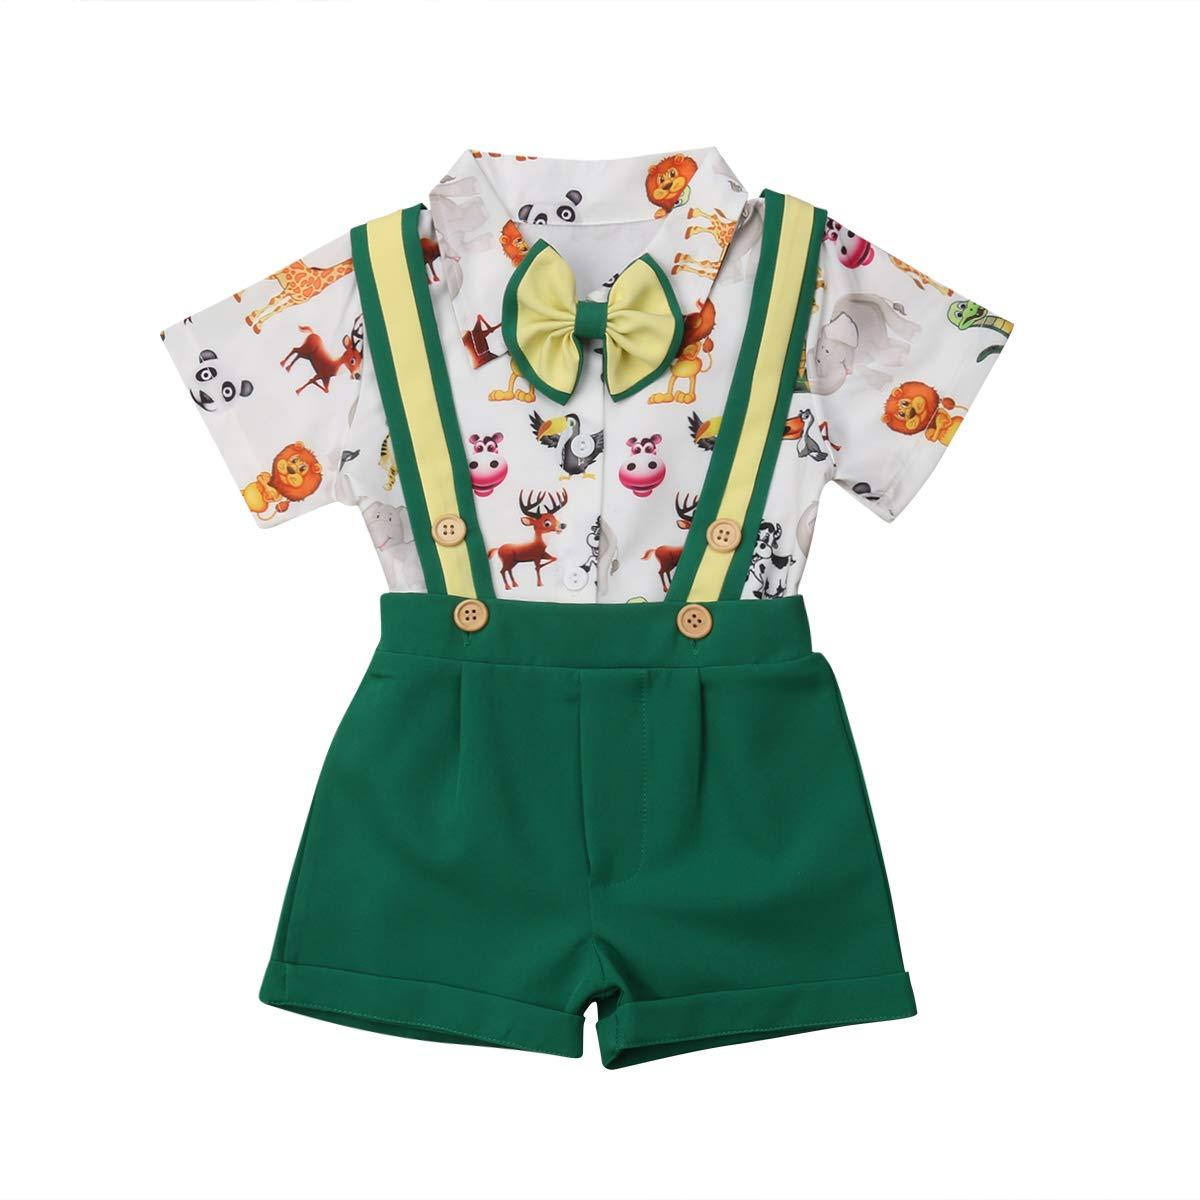 a682a7f84 Amazon.com: Toddler Baby Boys Short Sleeve Cartoon Print Bowtie Shirt  Suspender Shorts Pants Gentleman Suit Outfits Set: Clothing